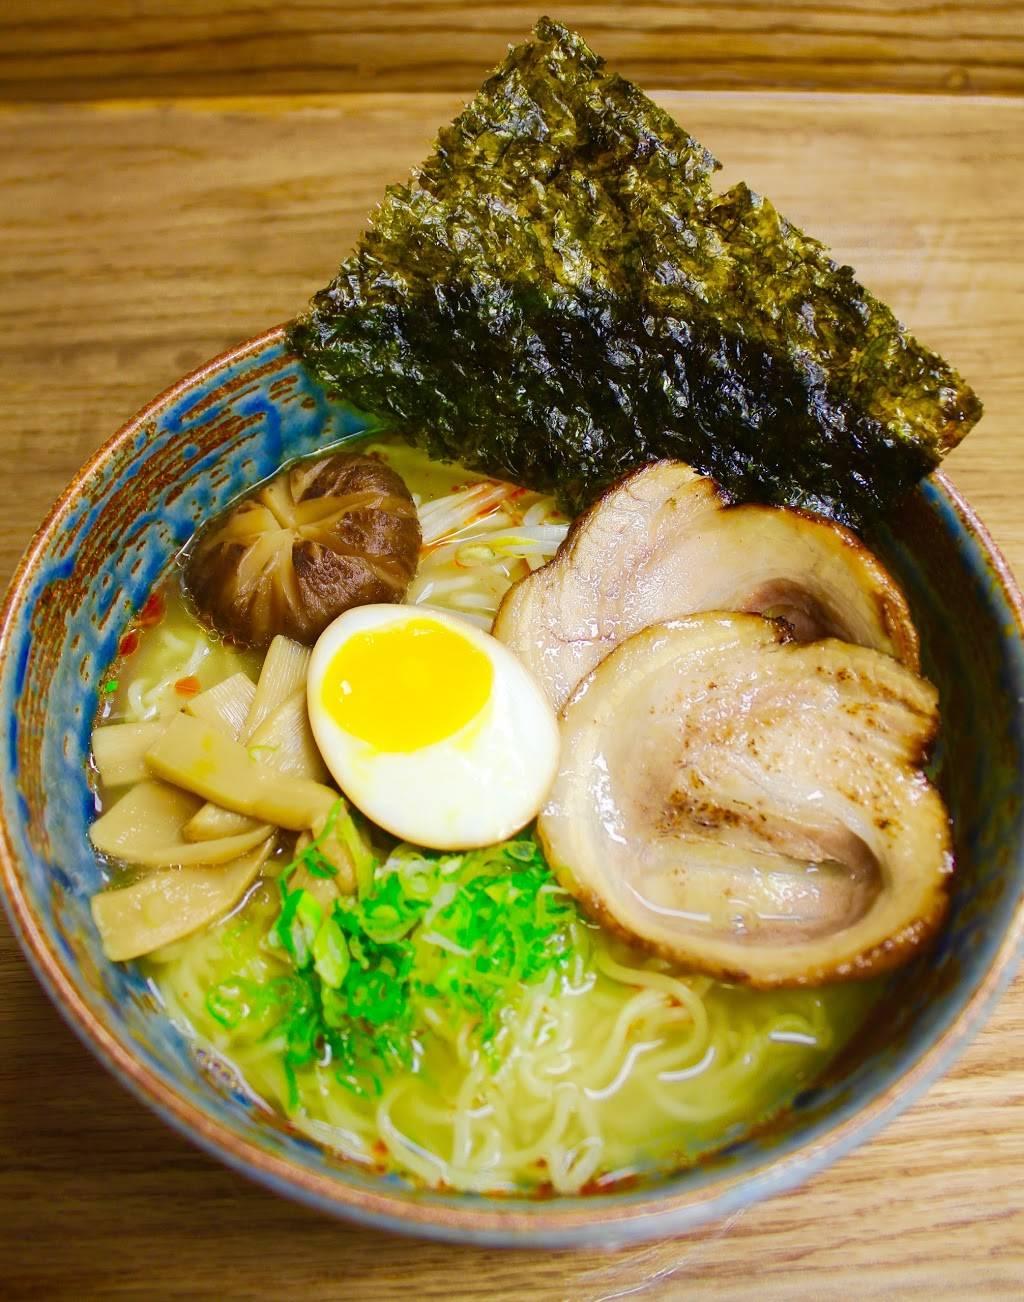 Samurai Sushi   restaurant   254 Park Ave, East Rutherford, NJ 07073, USA   2018961760 OR +1 201-896-1760